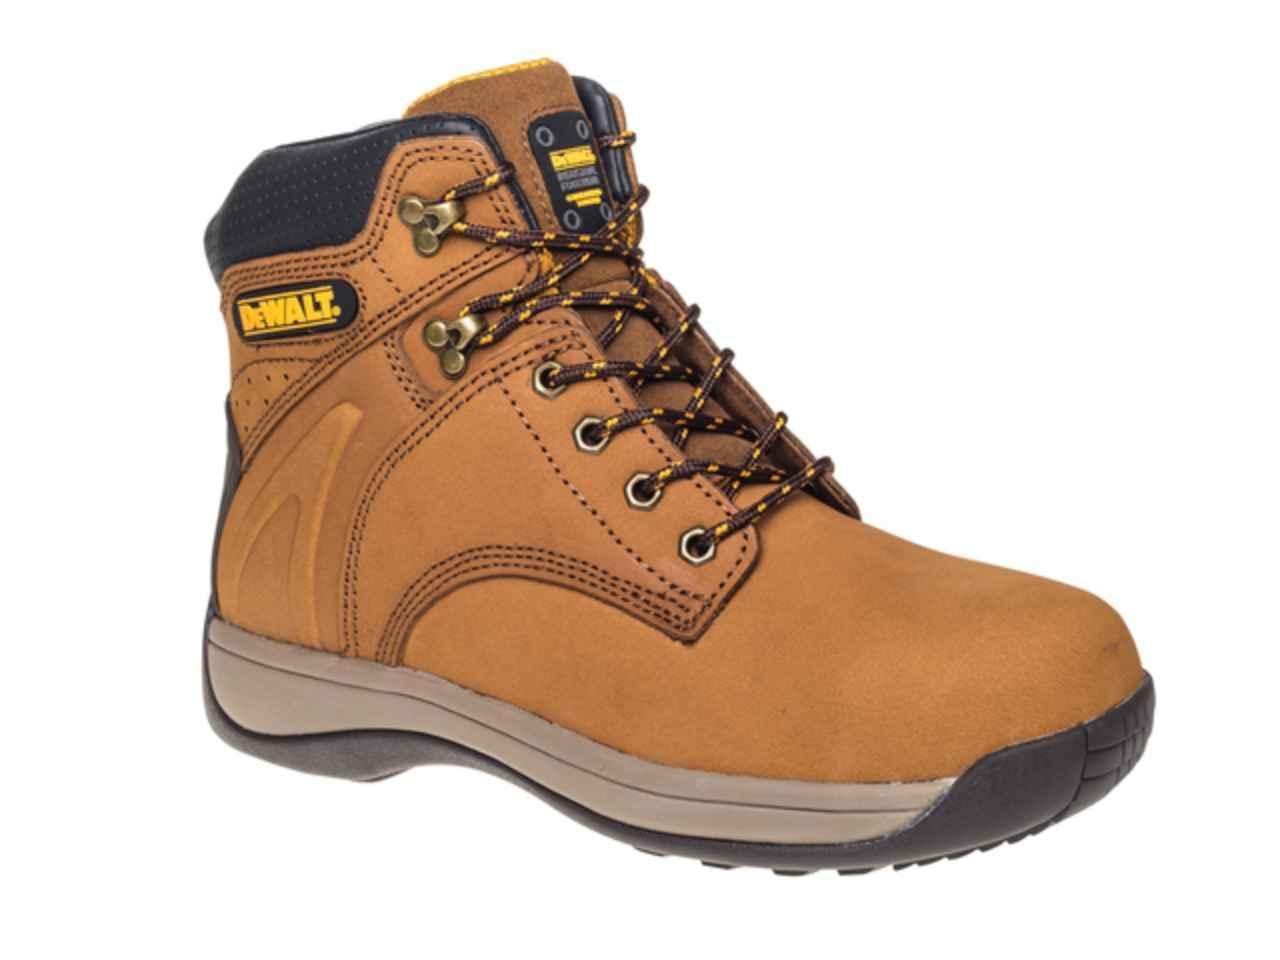 1cdc8f8772c DeWalt Extreme Sundance Safety Boots Various Sizes